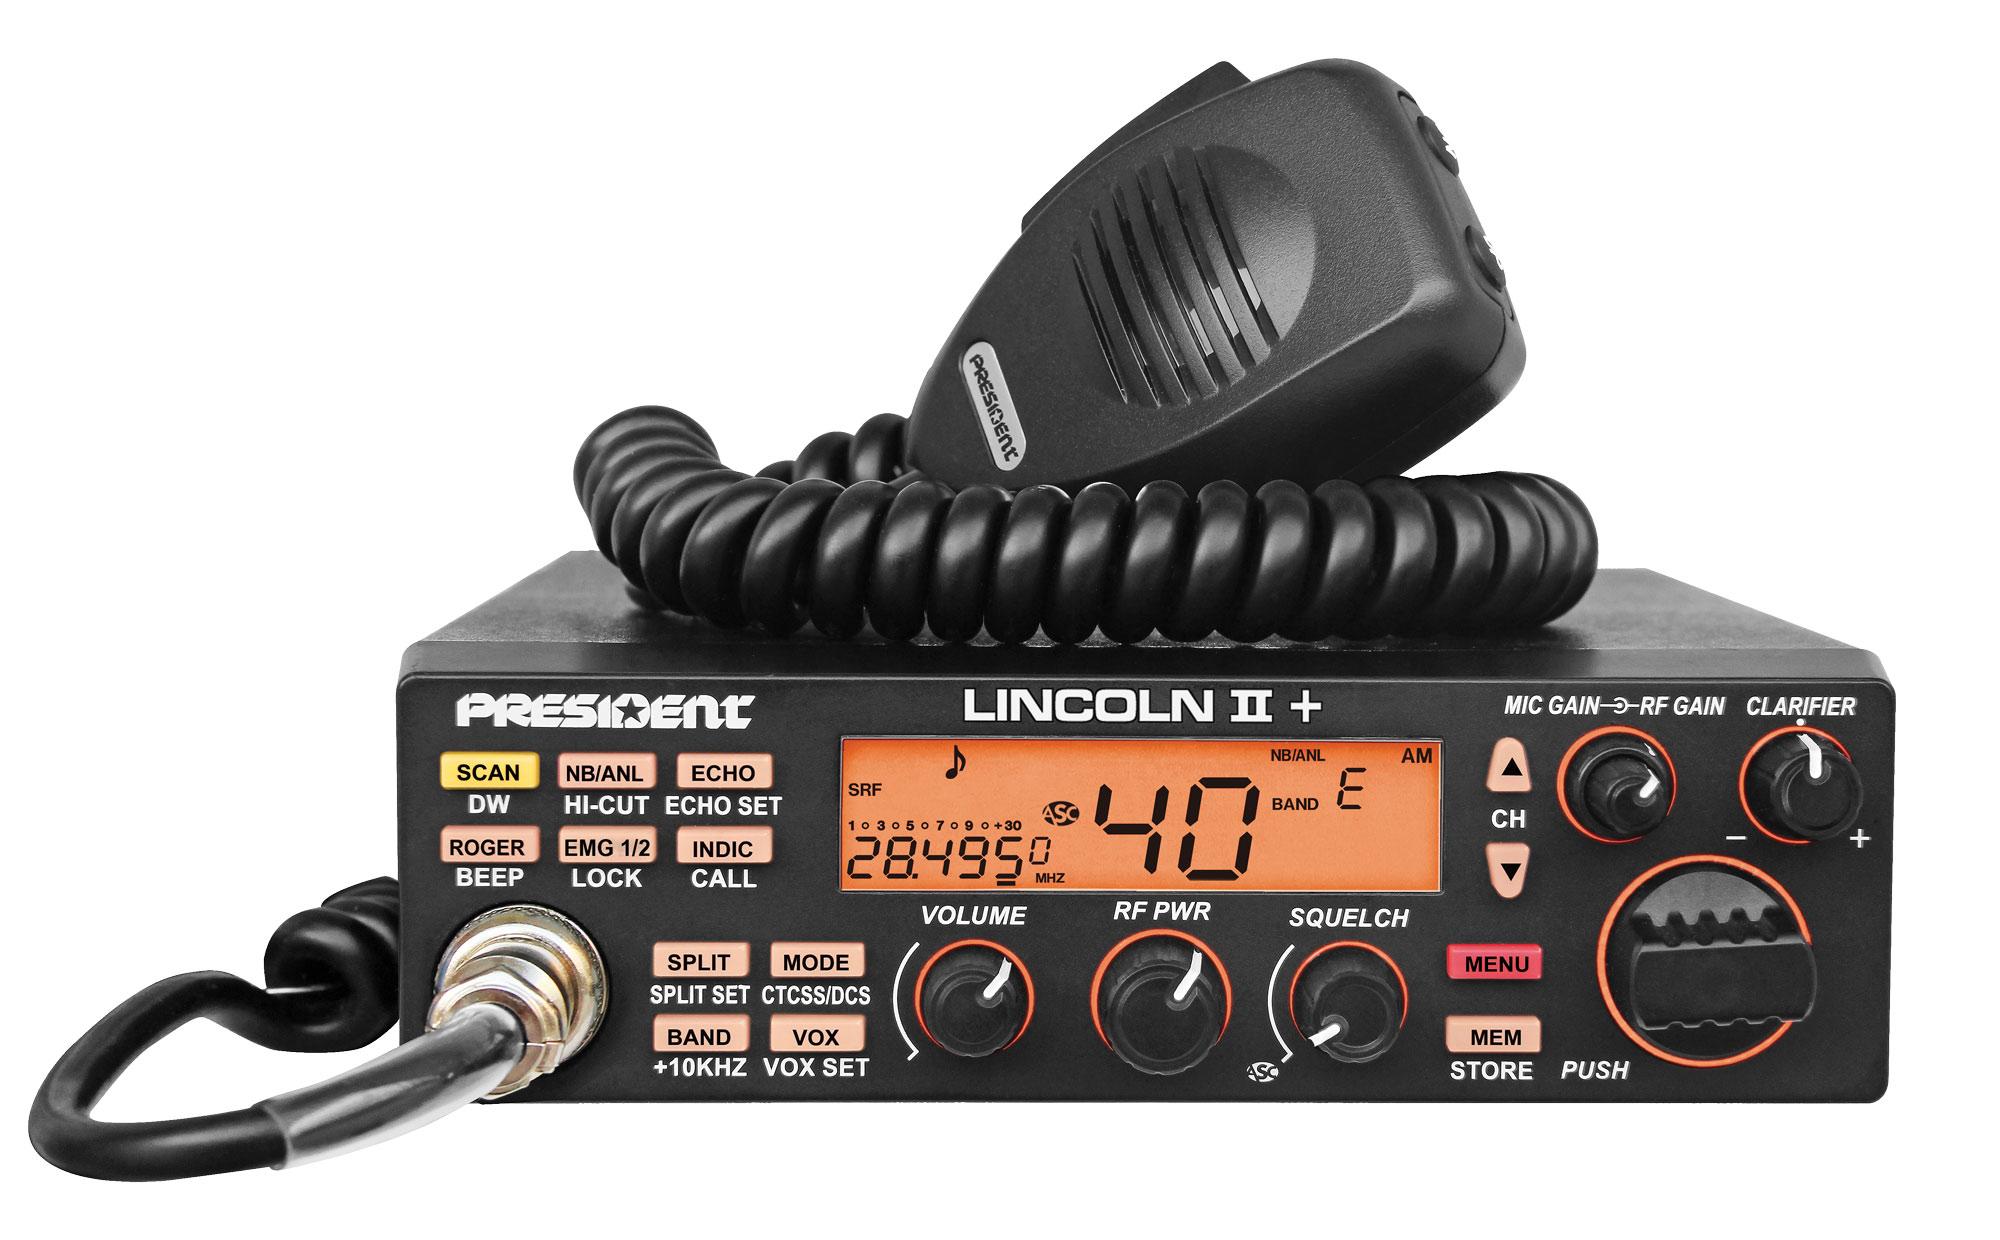 Lincoln Ii Ham Radio Cb President Electronics 79 Mark V Wiring Diagram Close